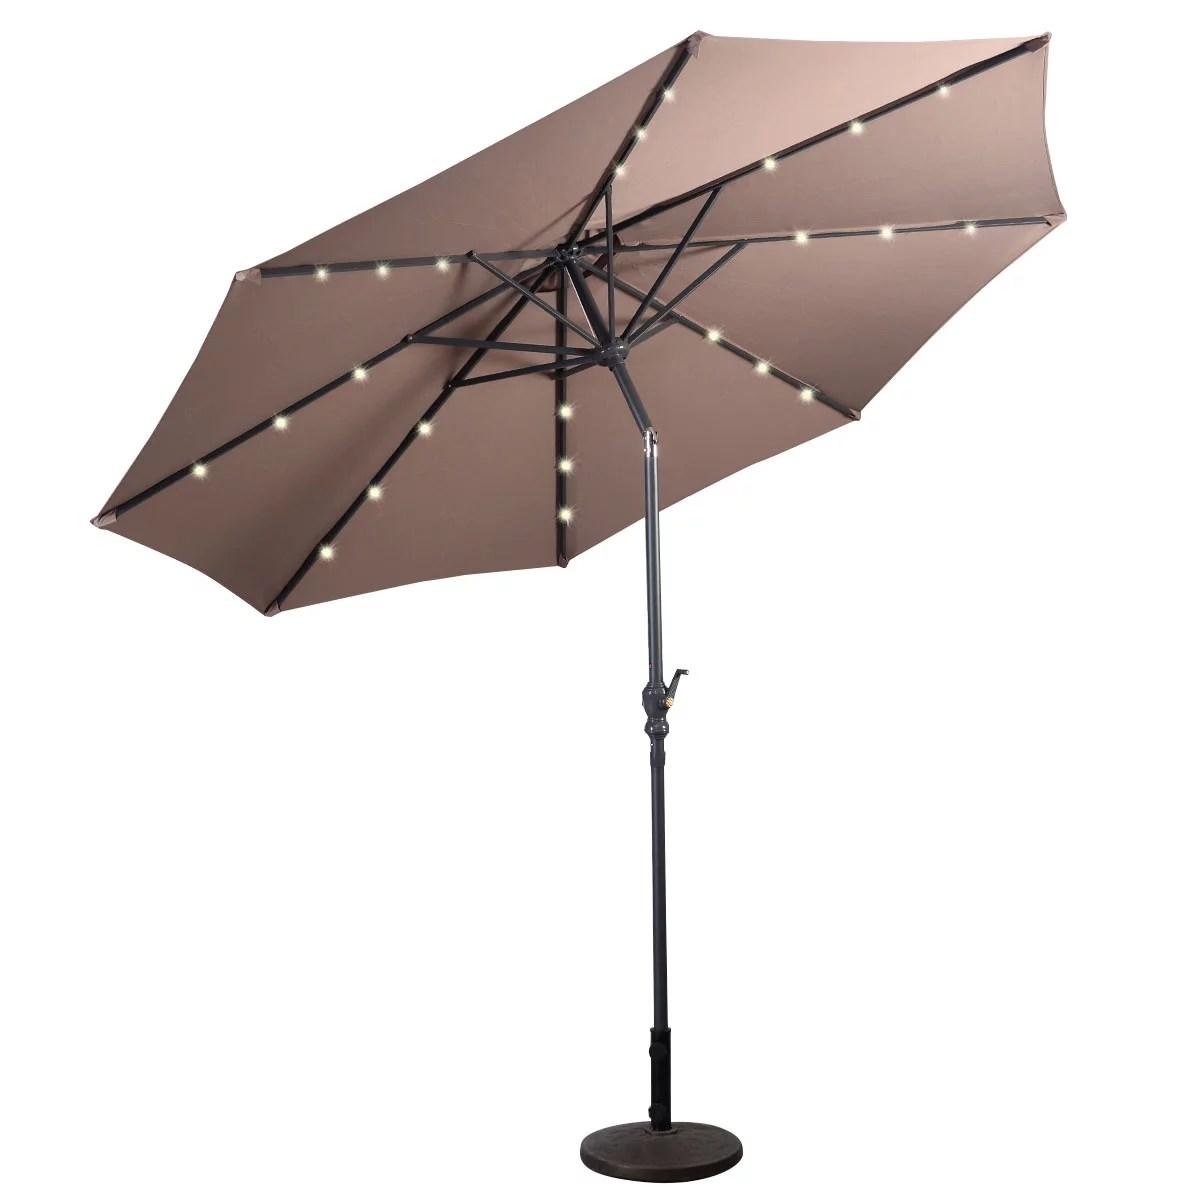 topbuy 10 ft patio market umbrella w solar powered led light walmart com